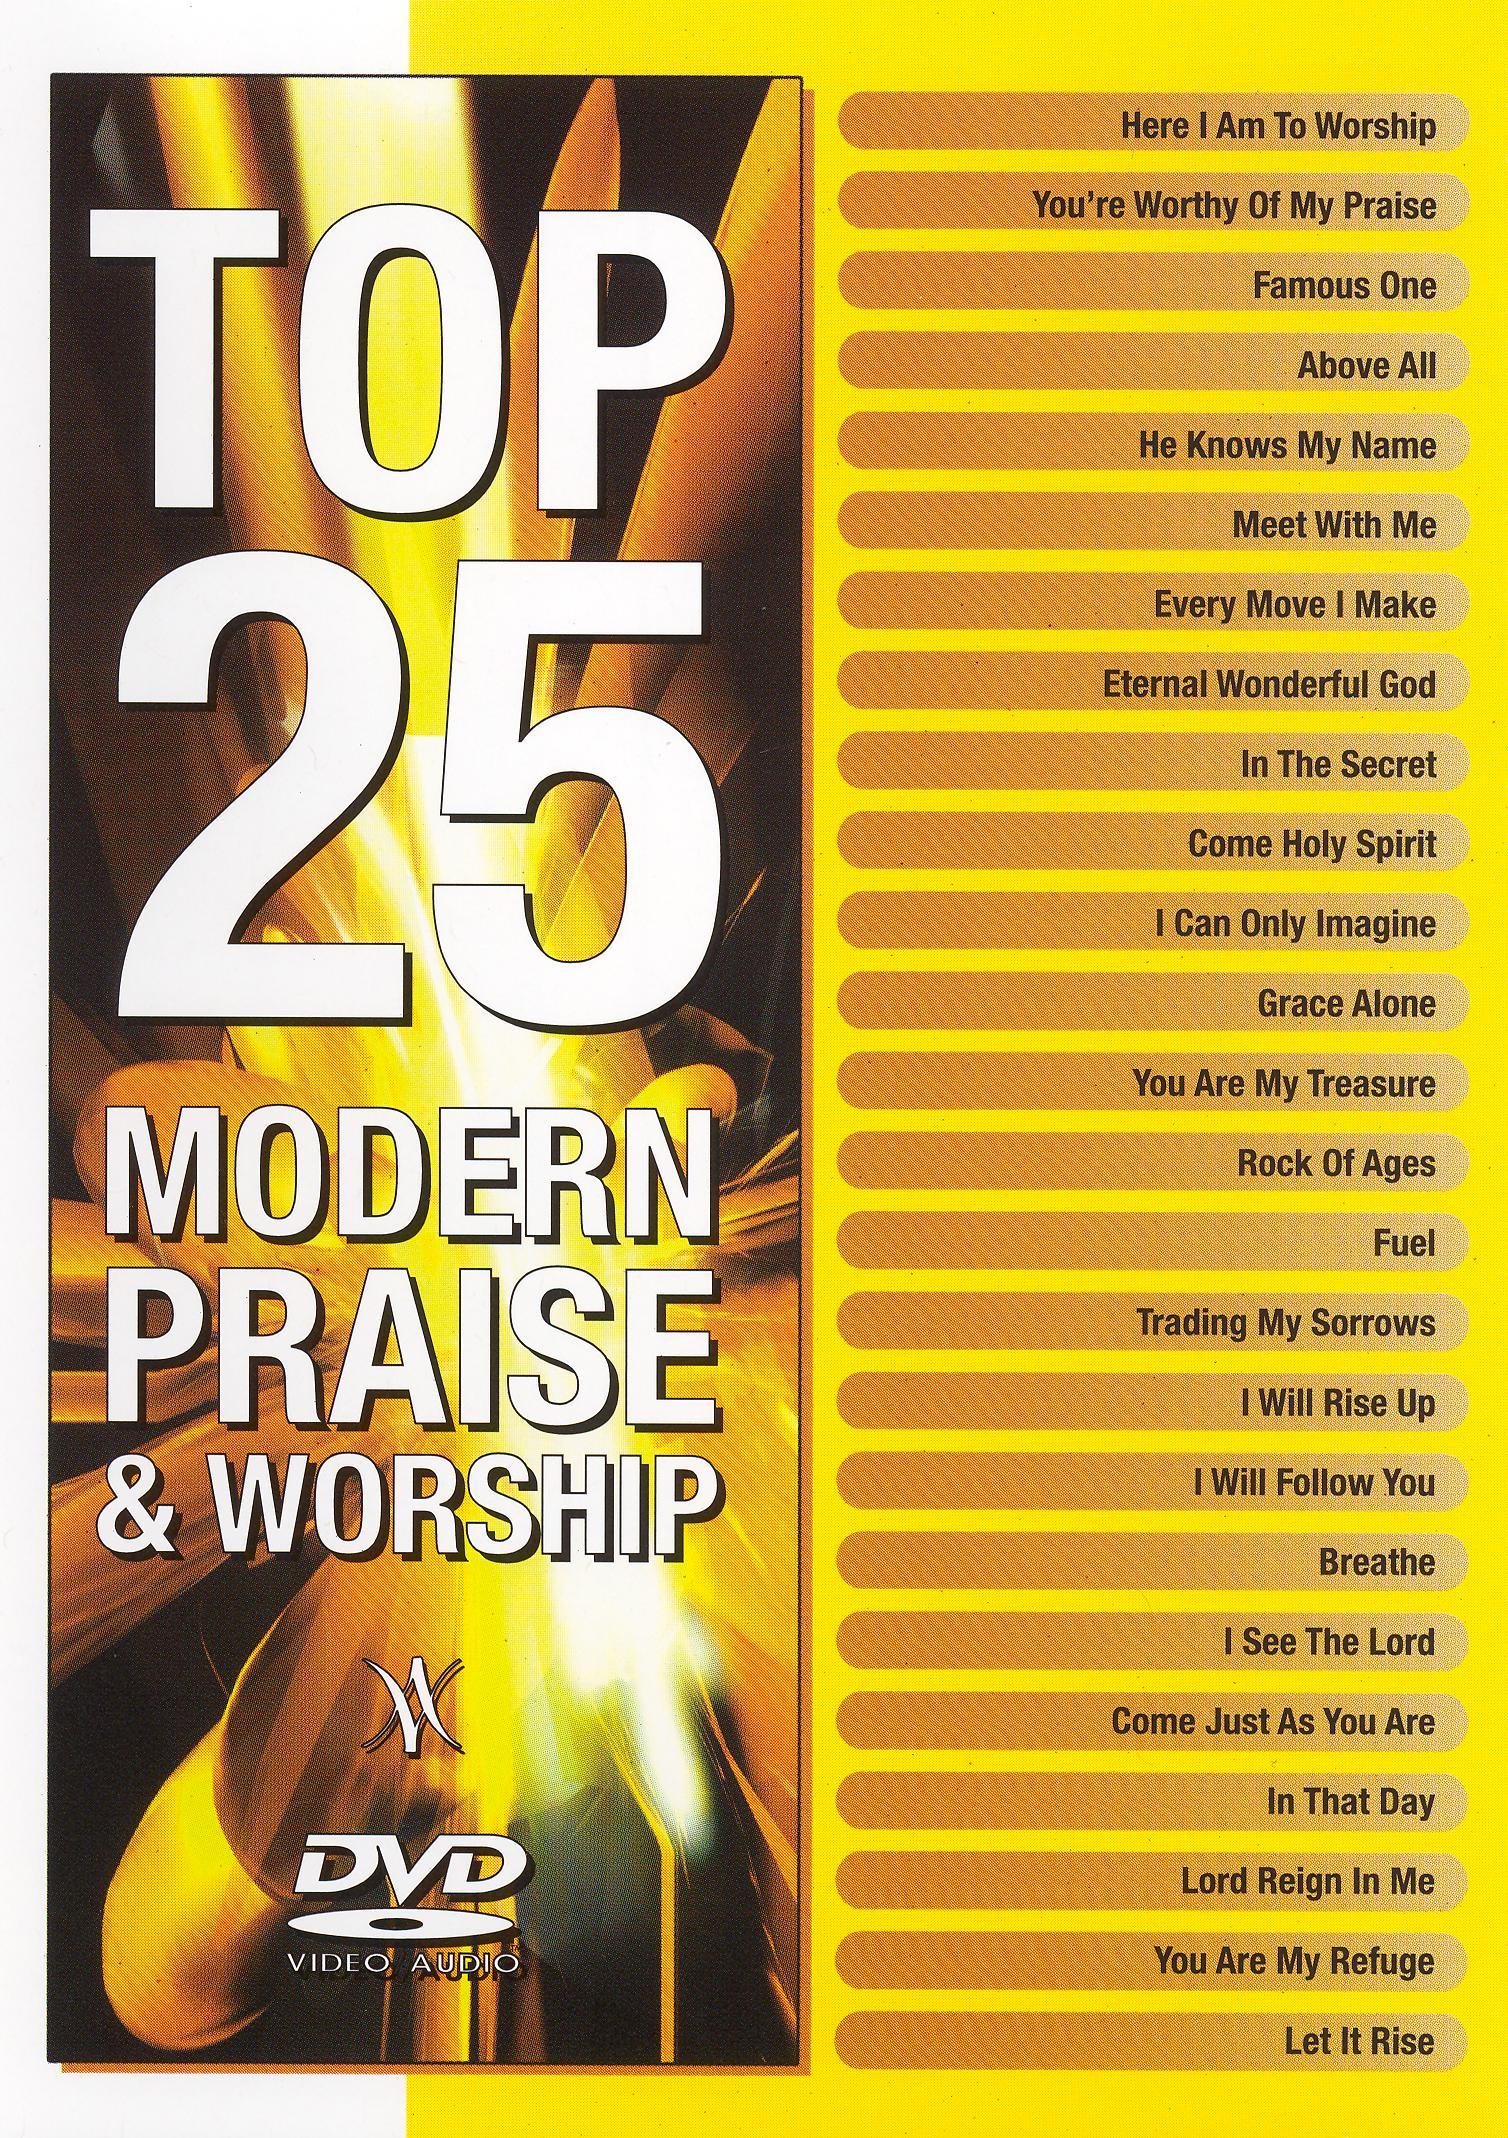 Top 25 Modern Praise and Worship DVD